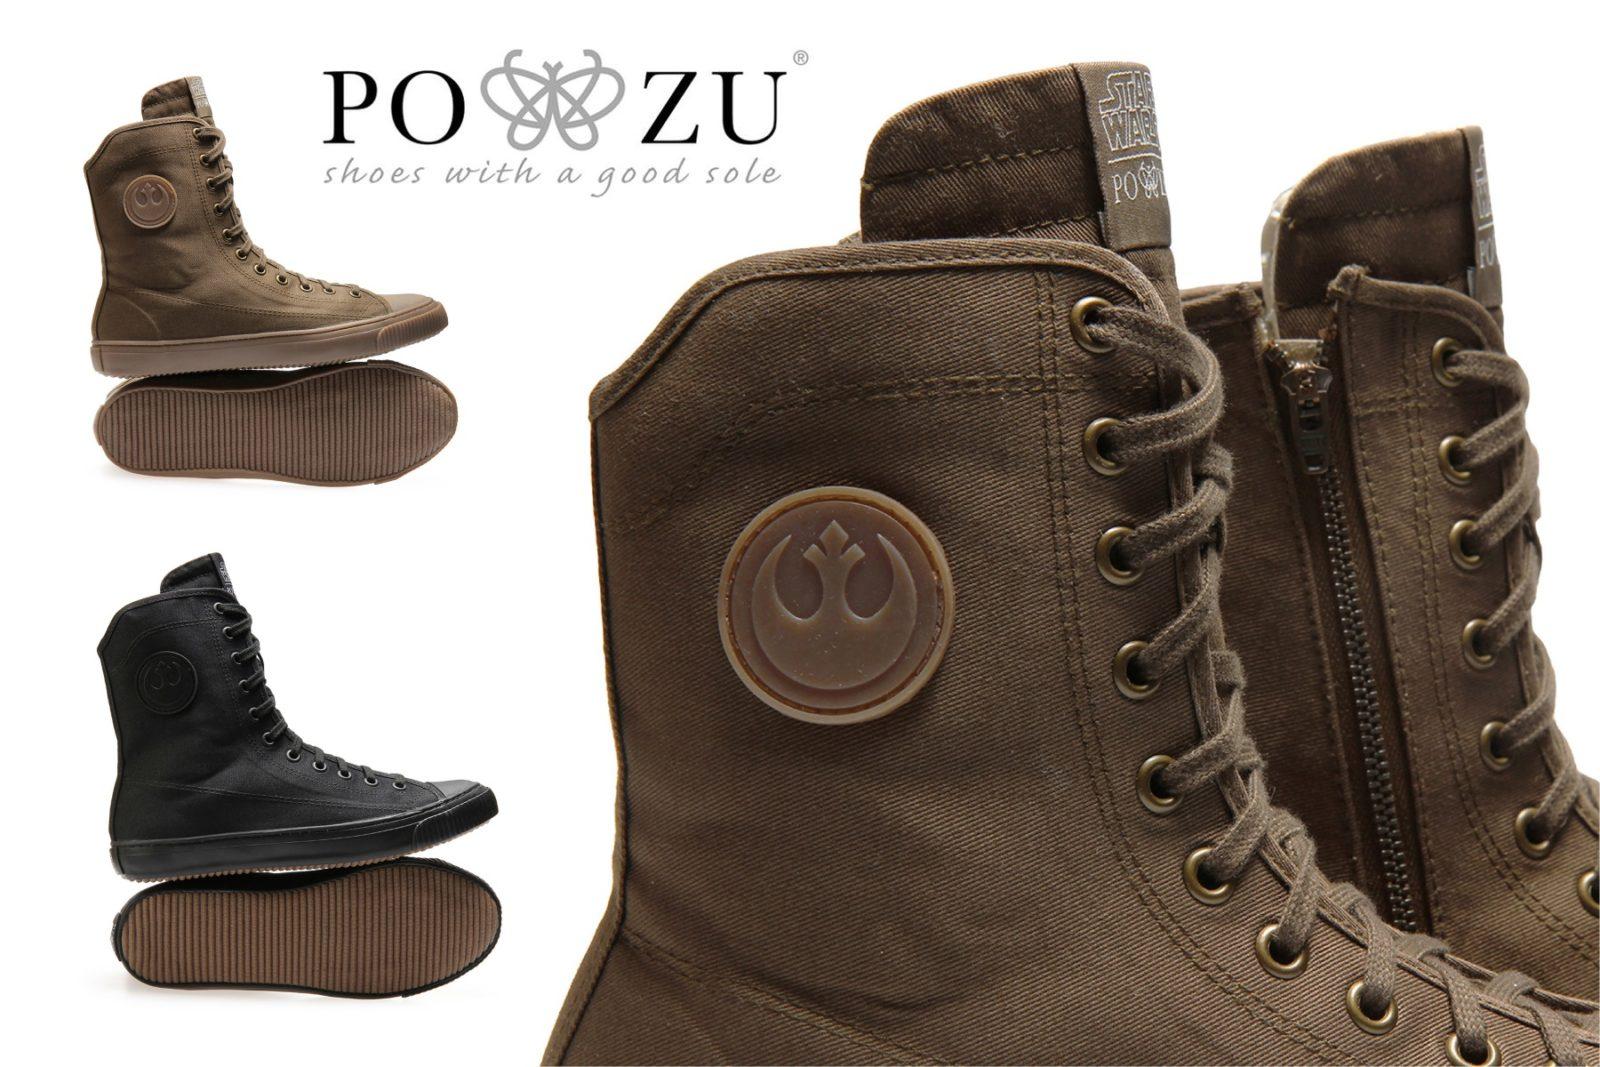 New Po-Zu x Star Wars Rebel Combat Sneakers